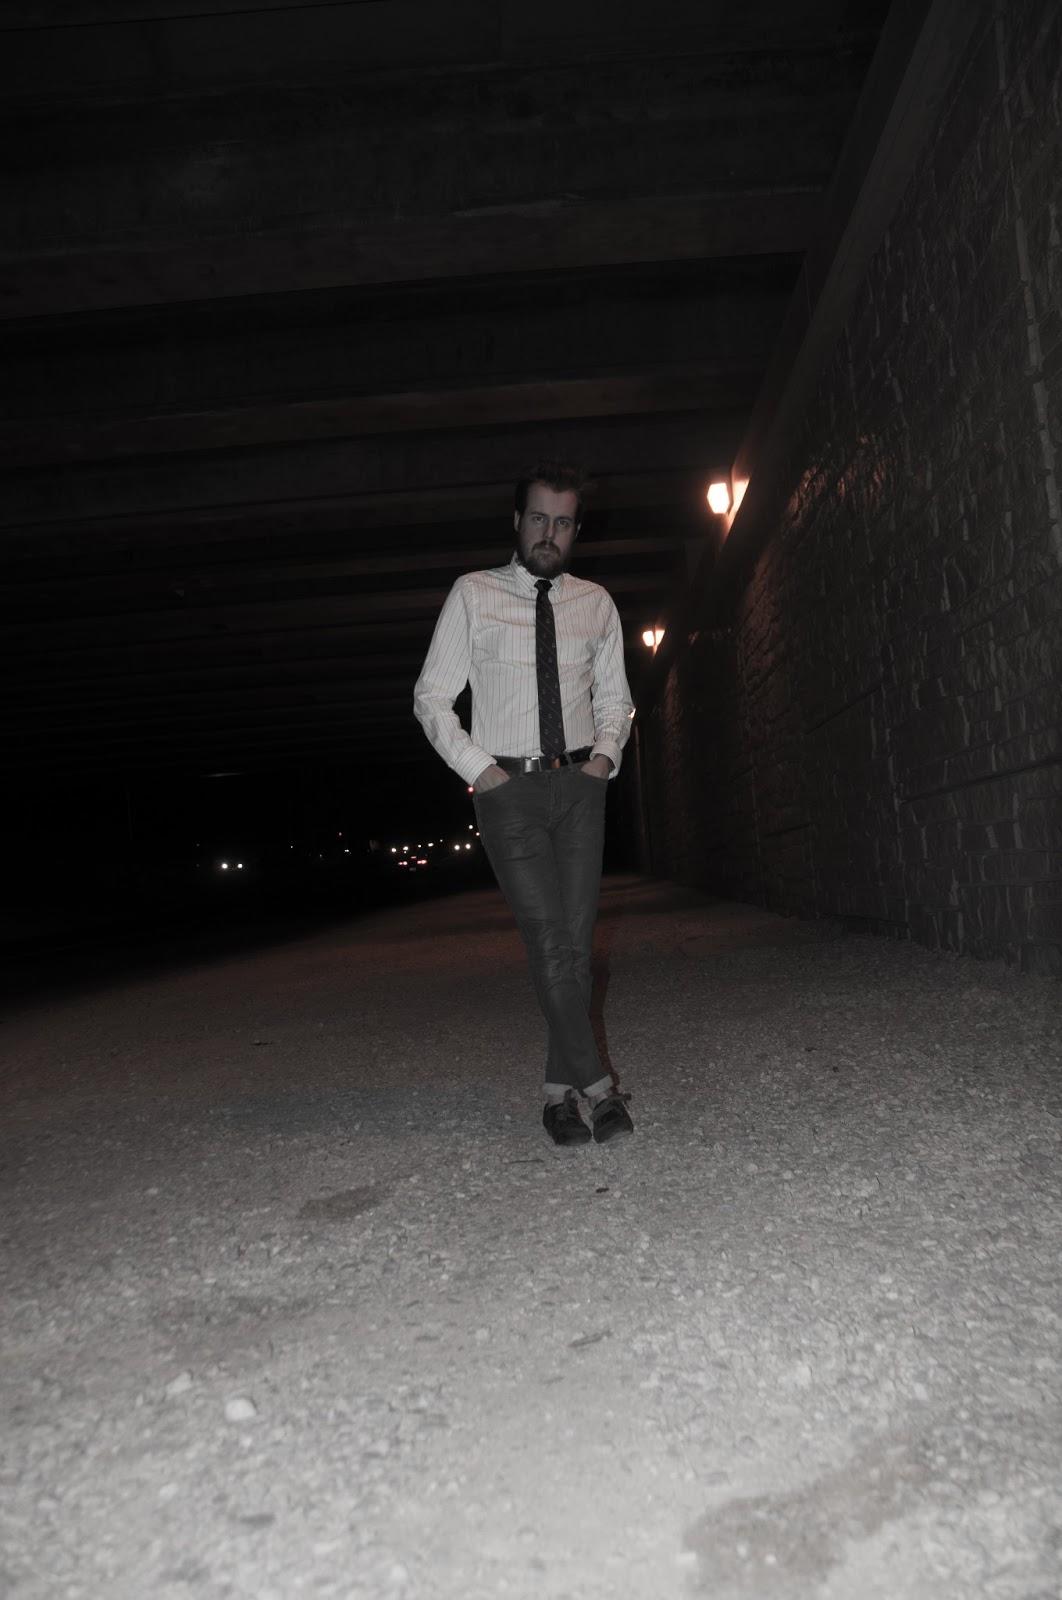 mens style, mens blog, mens style blog, mens fashion blog, fashion blogger, mens style, mens fashion, jcrew ootd, express extra slim shirt, slim shirt, express, all saints, all saints jeans, all saints cigarette jeans, express belt, express ootd, express 2 in 1 reversible belt, naya, nordstrom, nordstrom ootd, nordstrom savy, nordstrom outfit of the day, jcrew, jcrew ootd, jcrew factory mini anchor tie, anchor, jcrew tie,